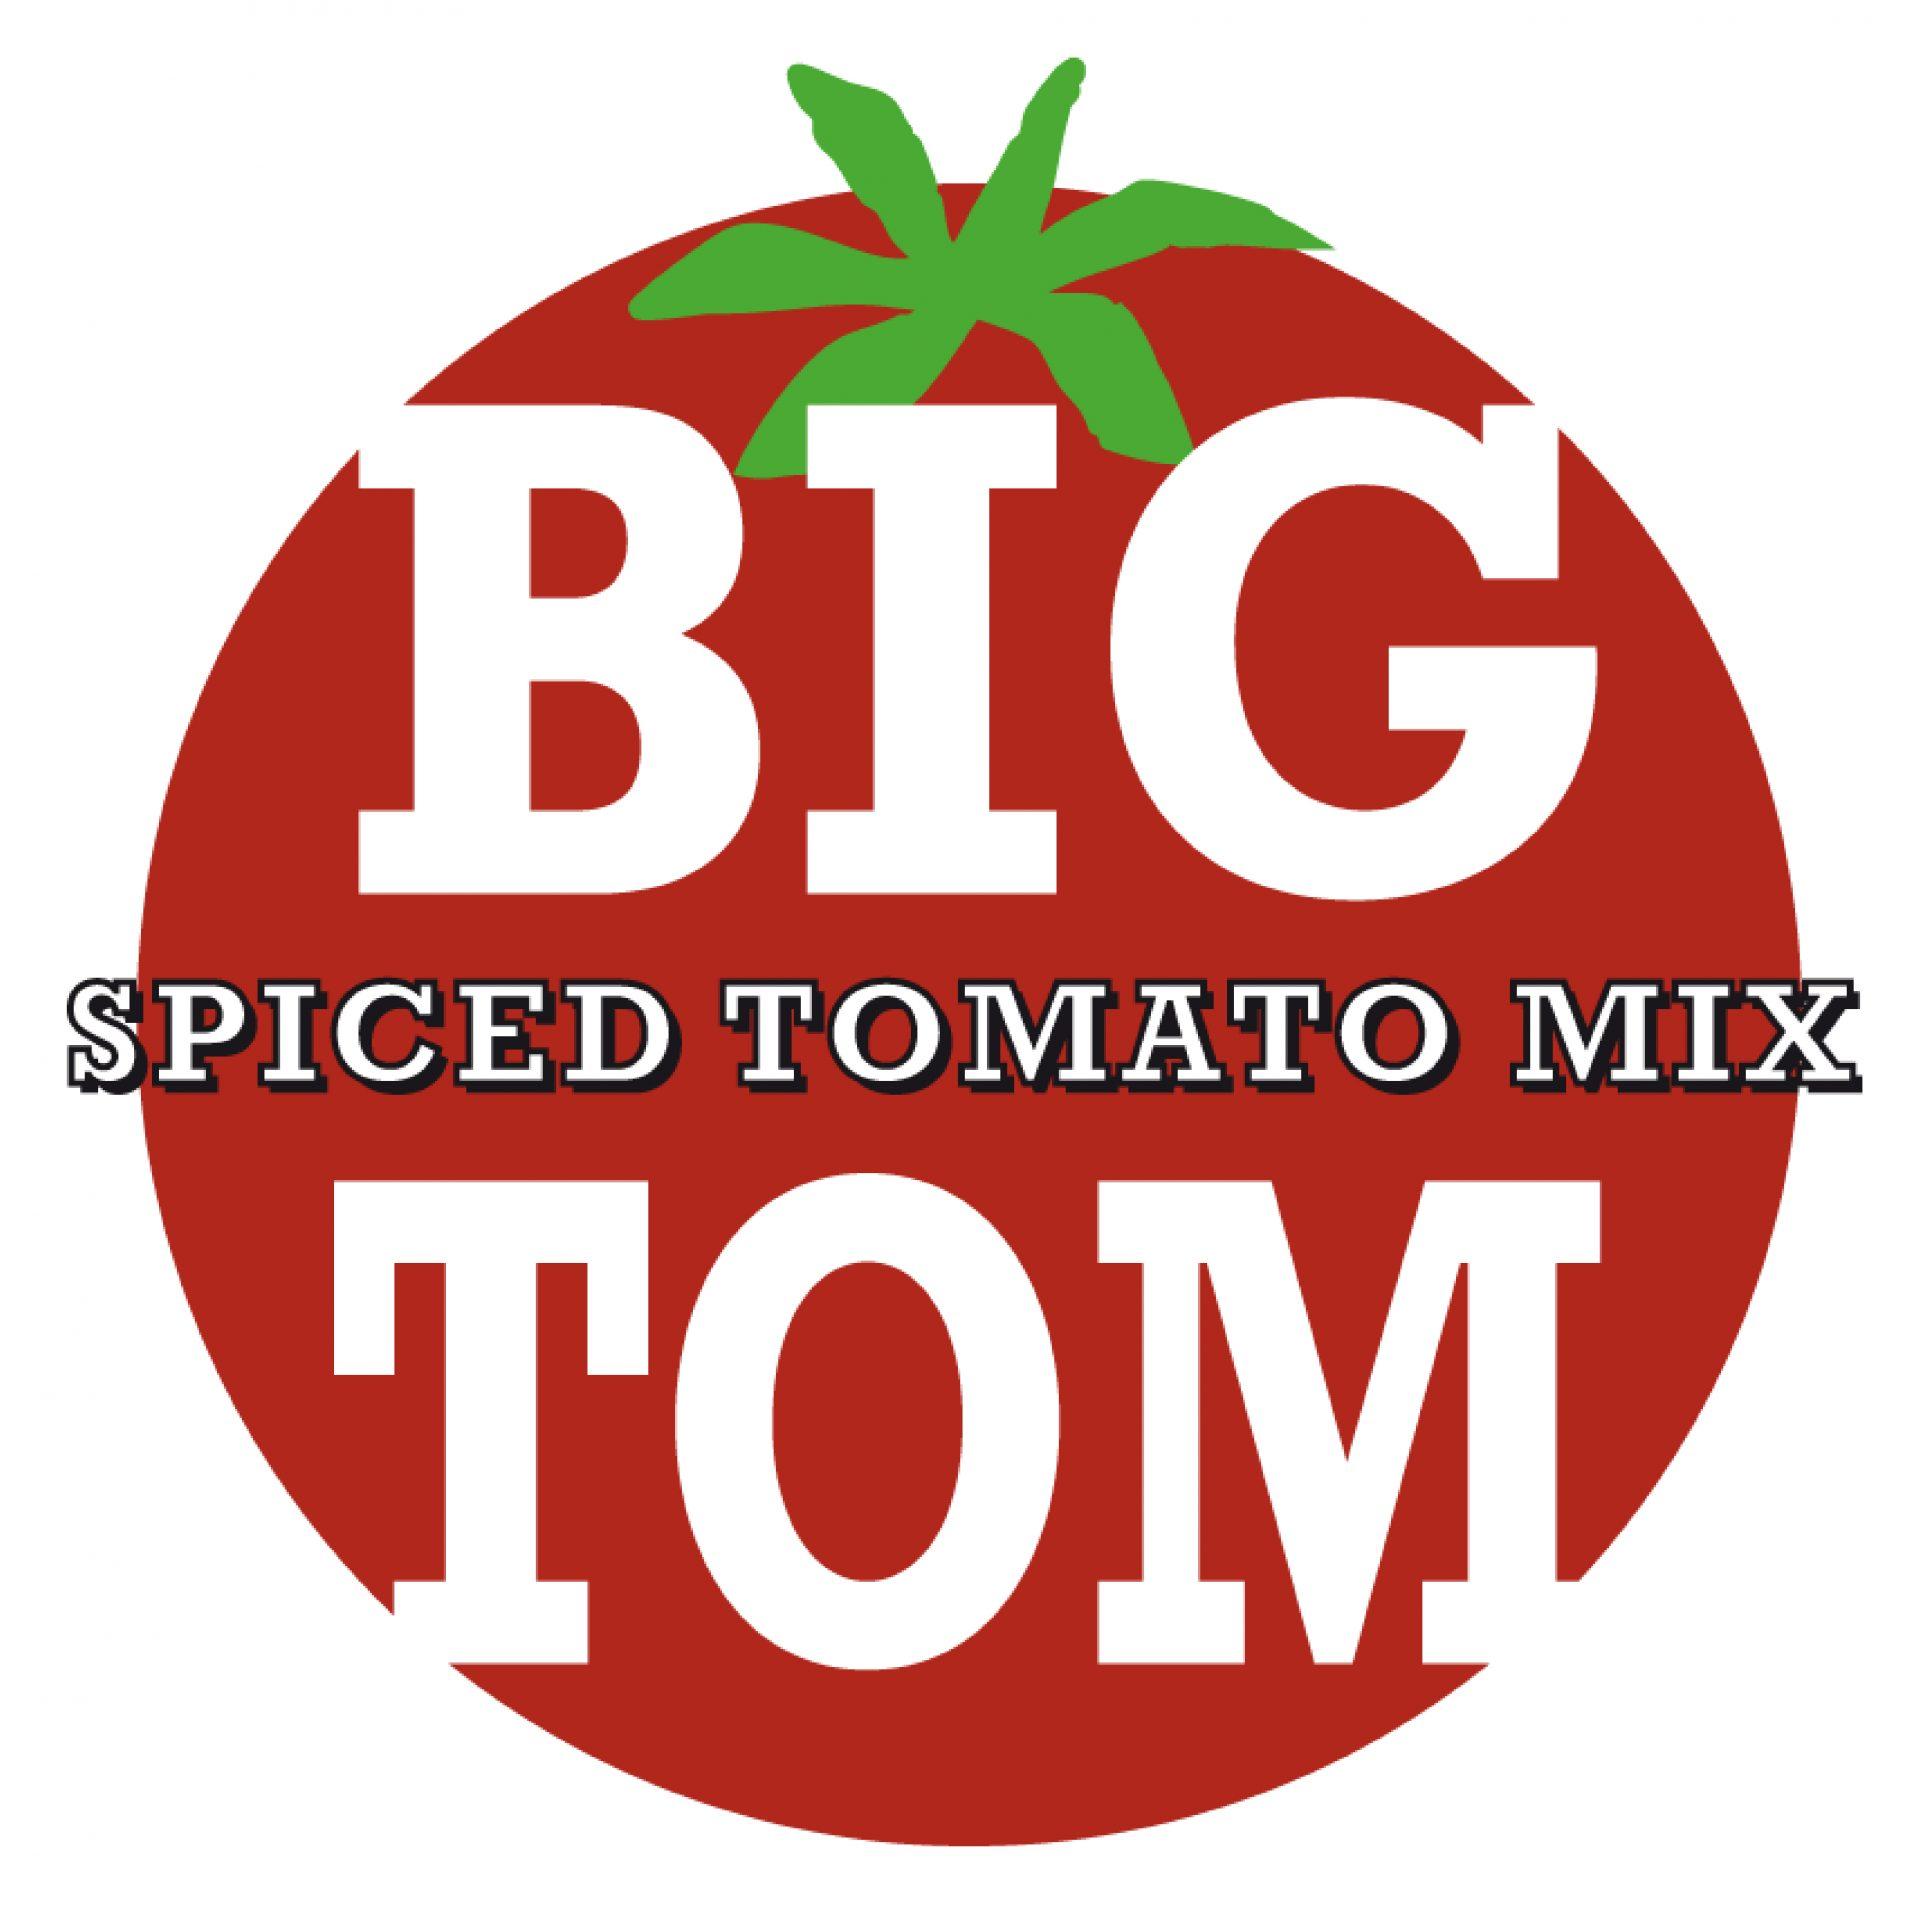 nectar-utrecht-frisdrank-engeland-big-tom-spicy-tomato-juice-logo